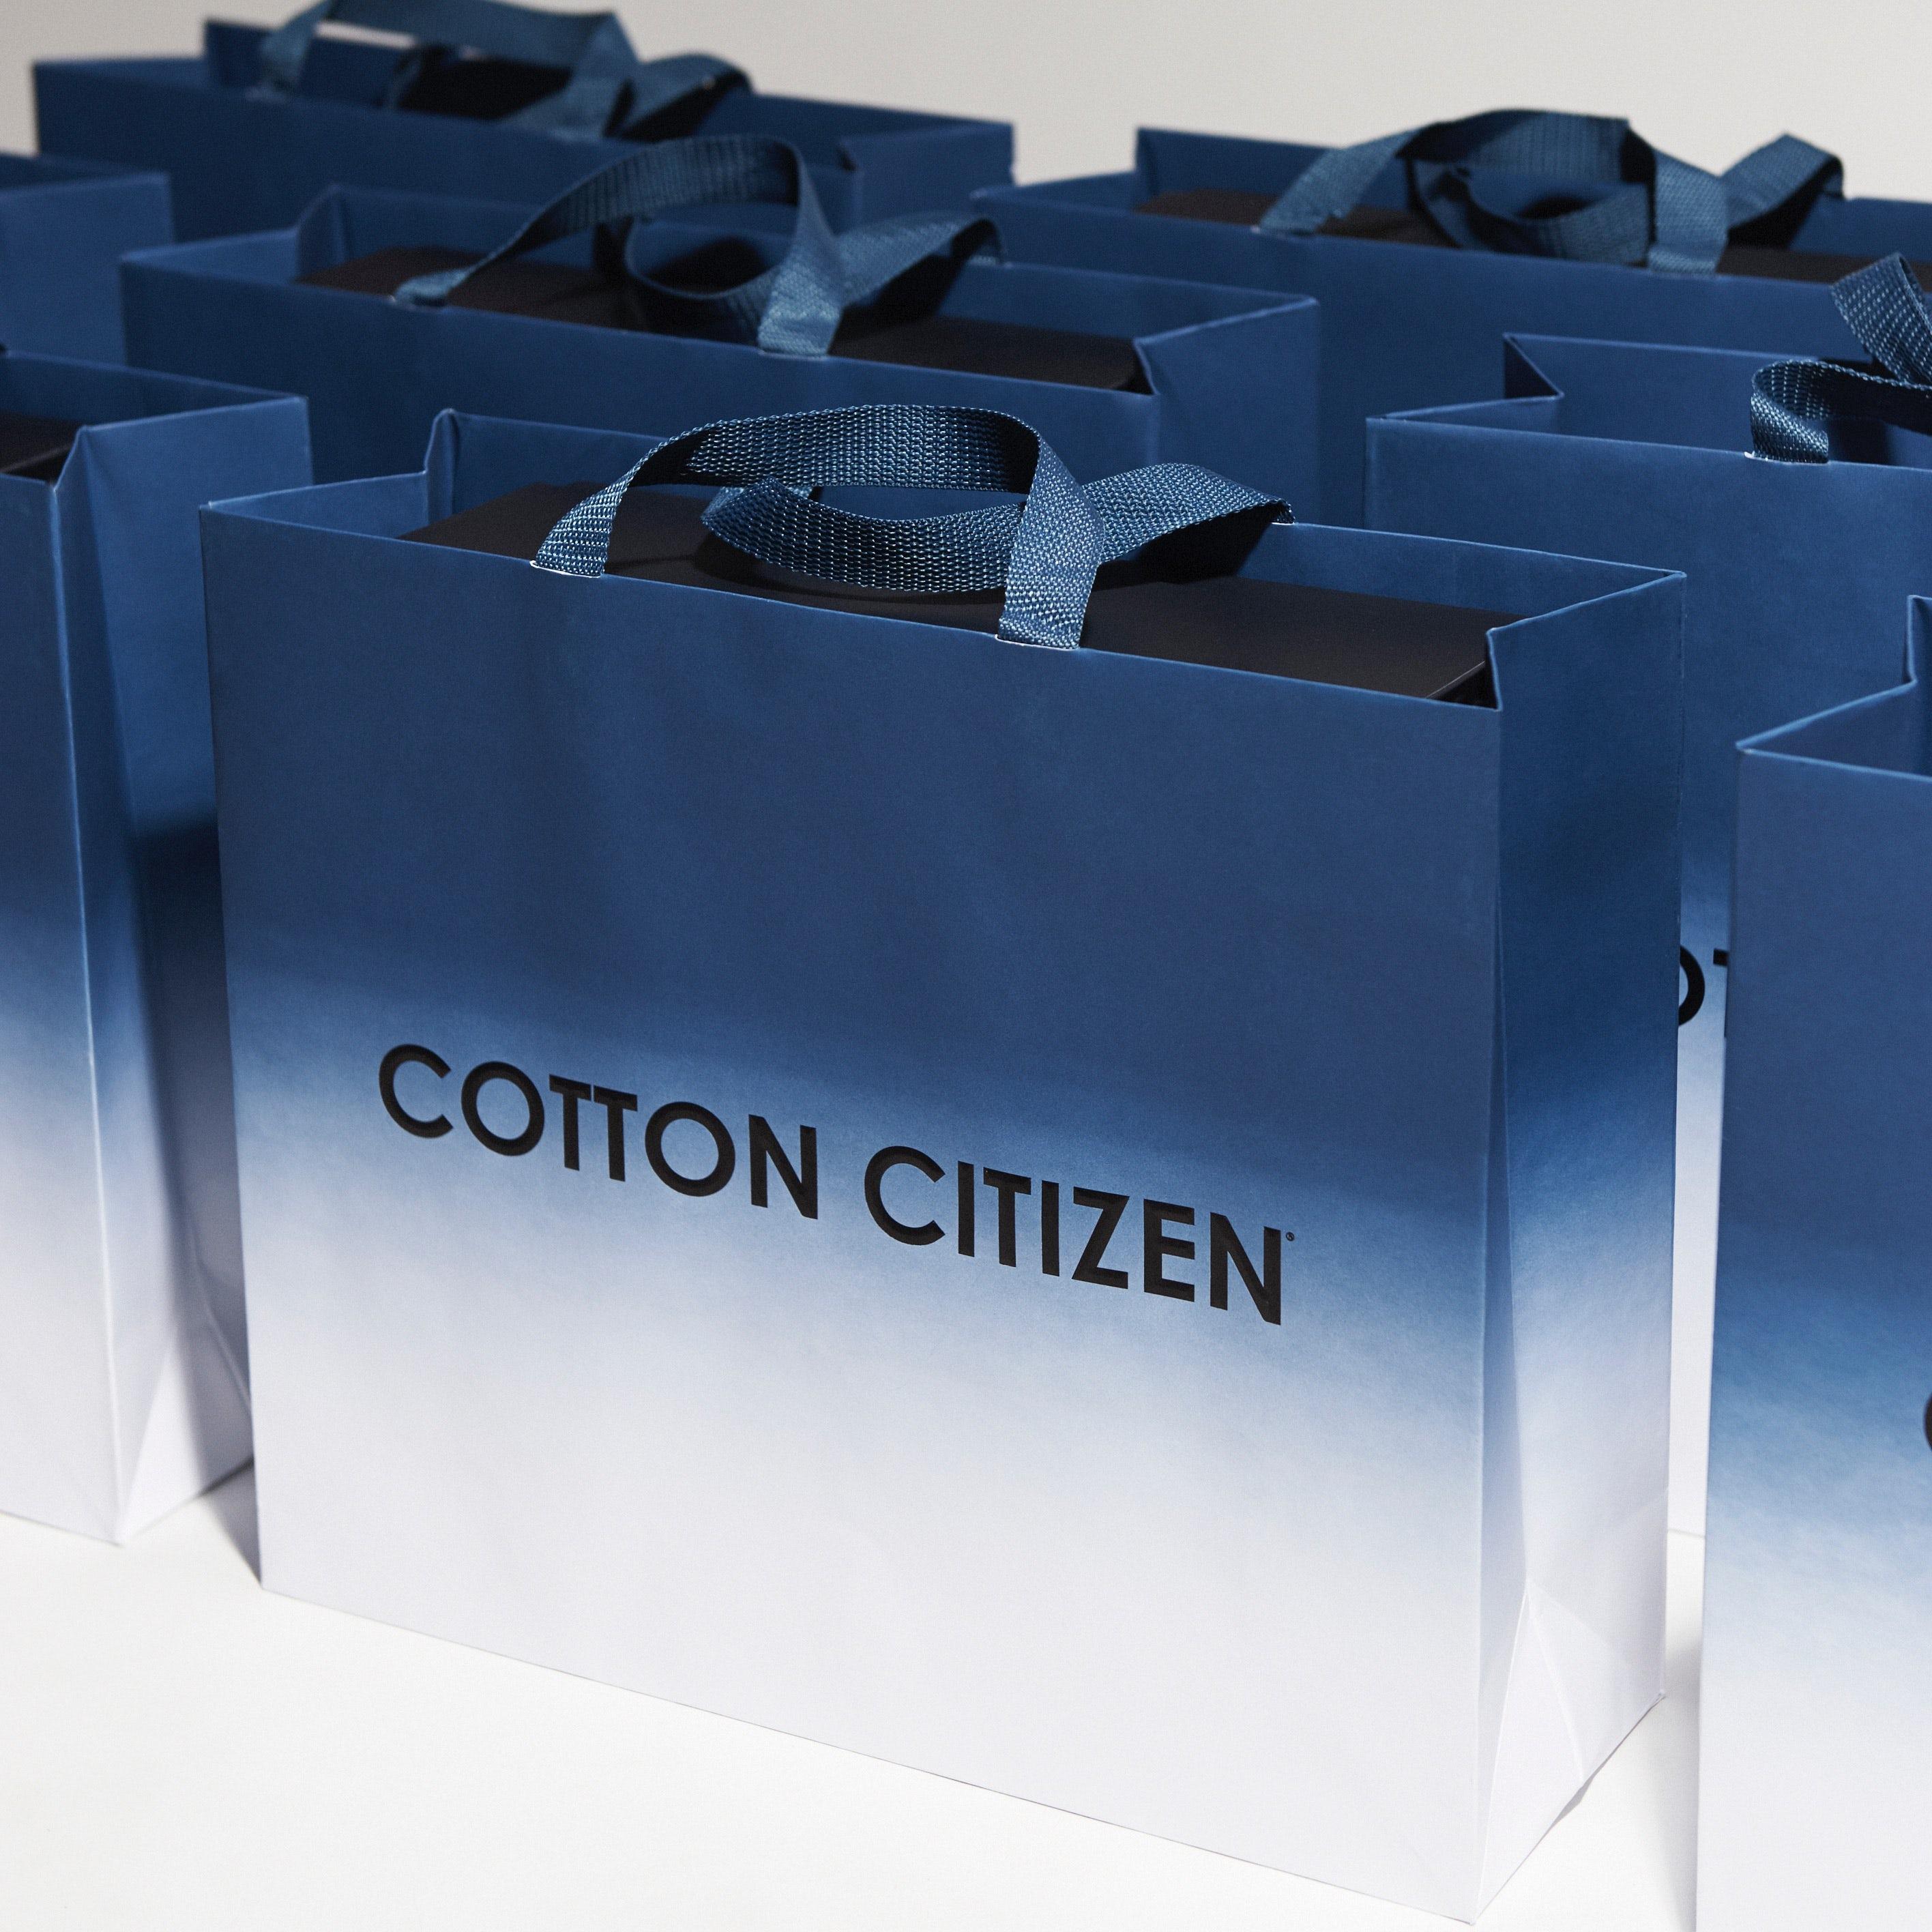 Cotton Citizen company logo